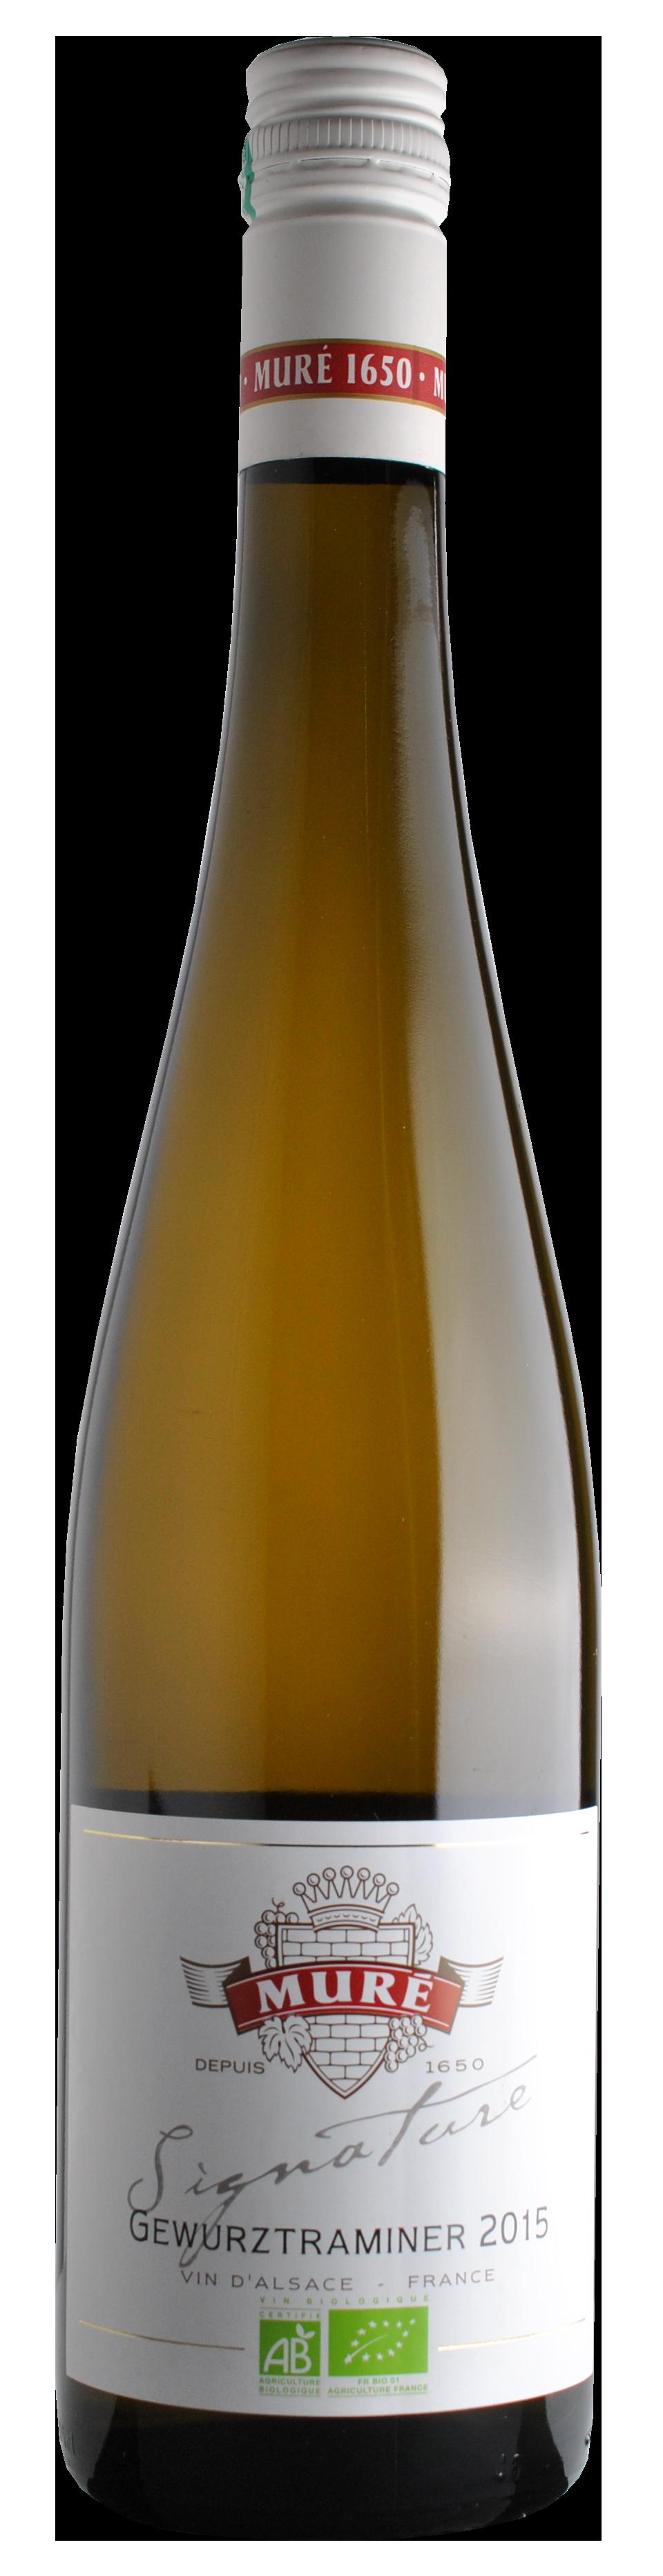 Gewurztraminer Signature - Domaine Muré - Vins Pirard